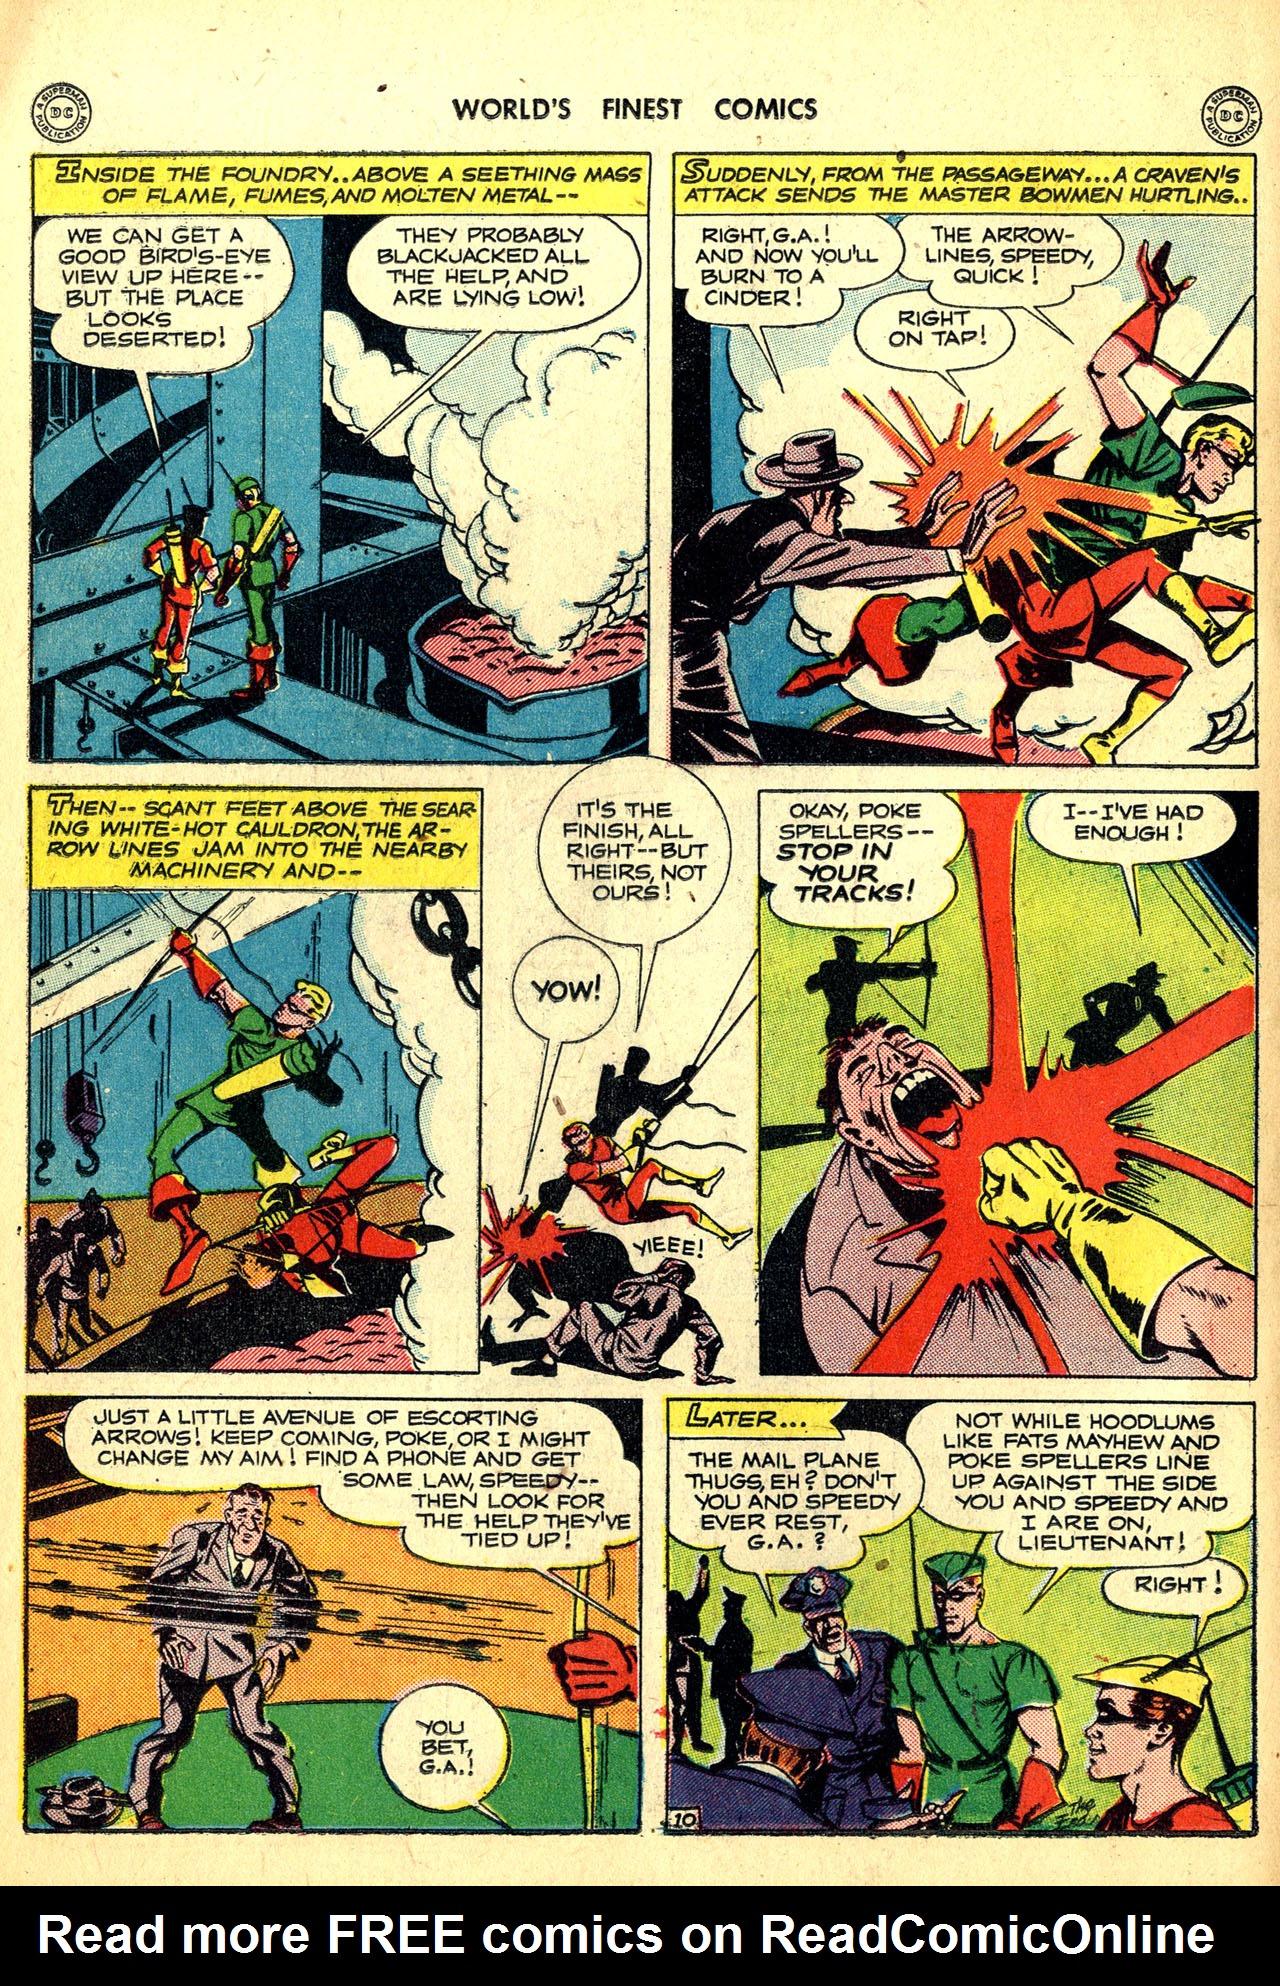 Read online World's Finest Comics comic -  Issue #18 - 58